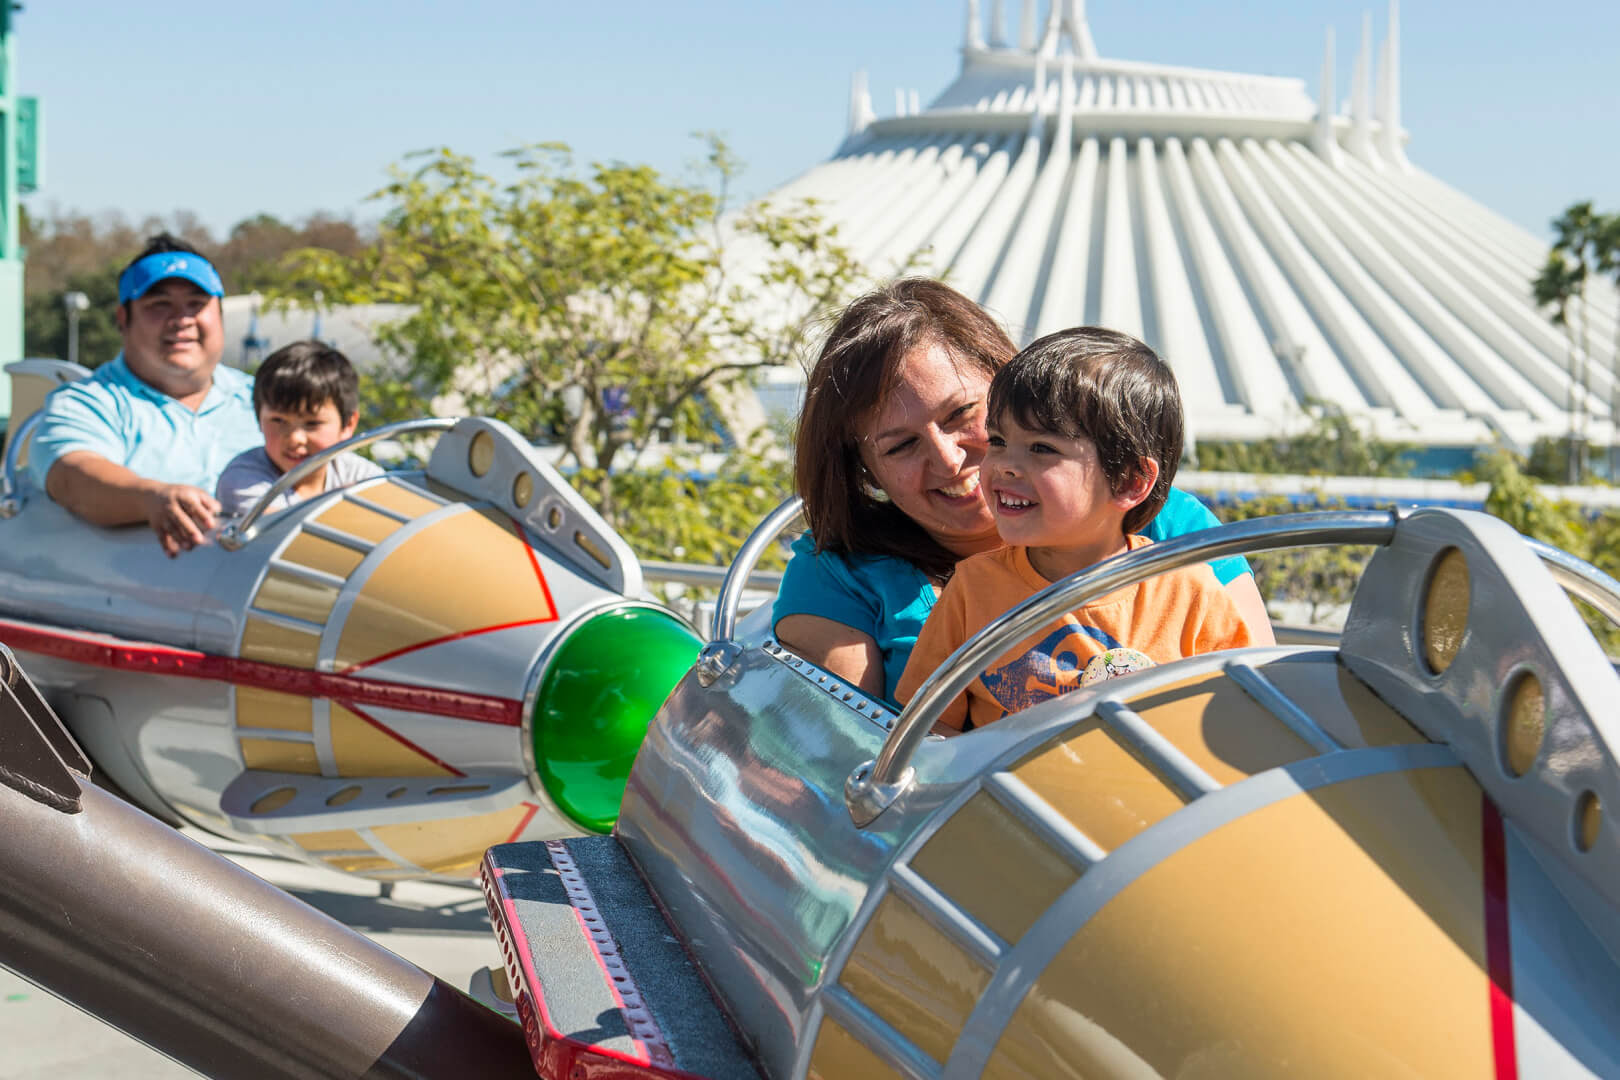 Walt Disney World introduces kidfriendly summer vacation